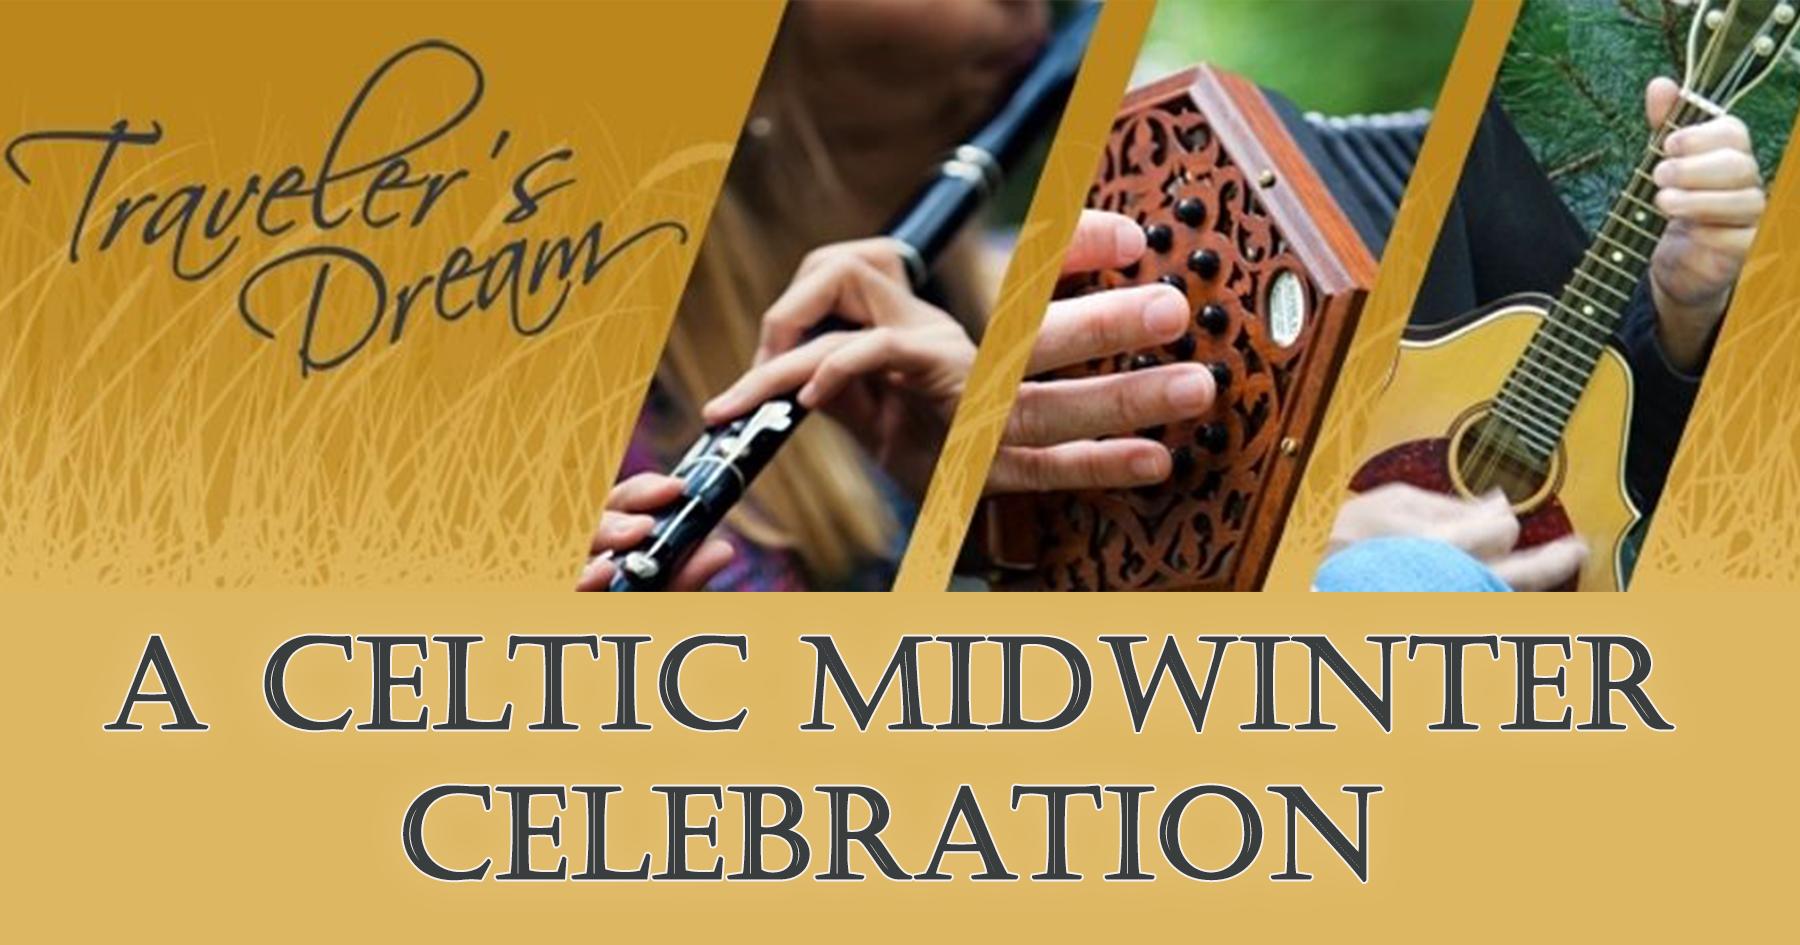 Celtic Midwinter Celebration with Traveler's Dream